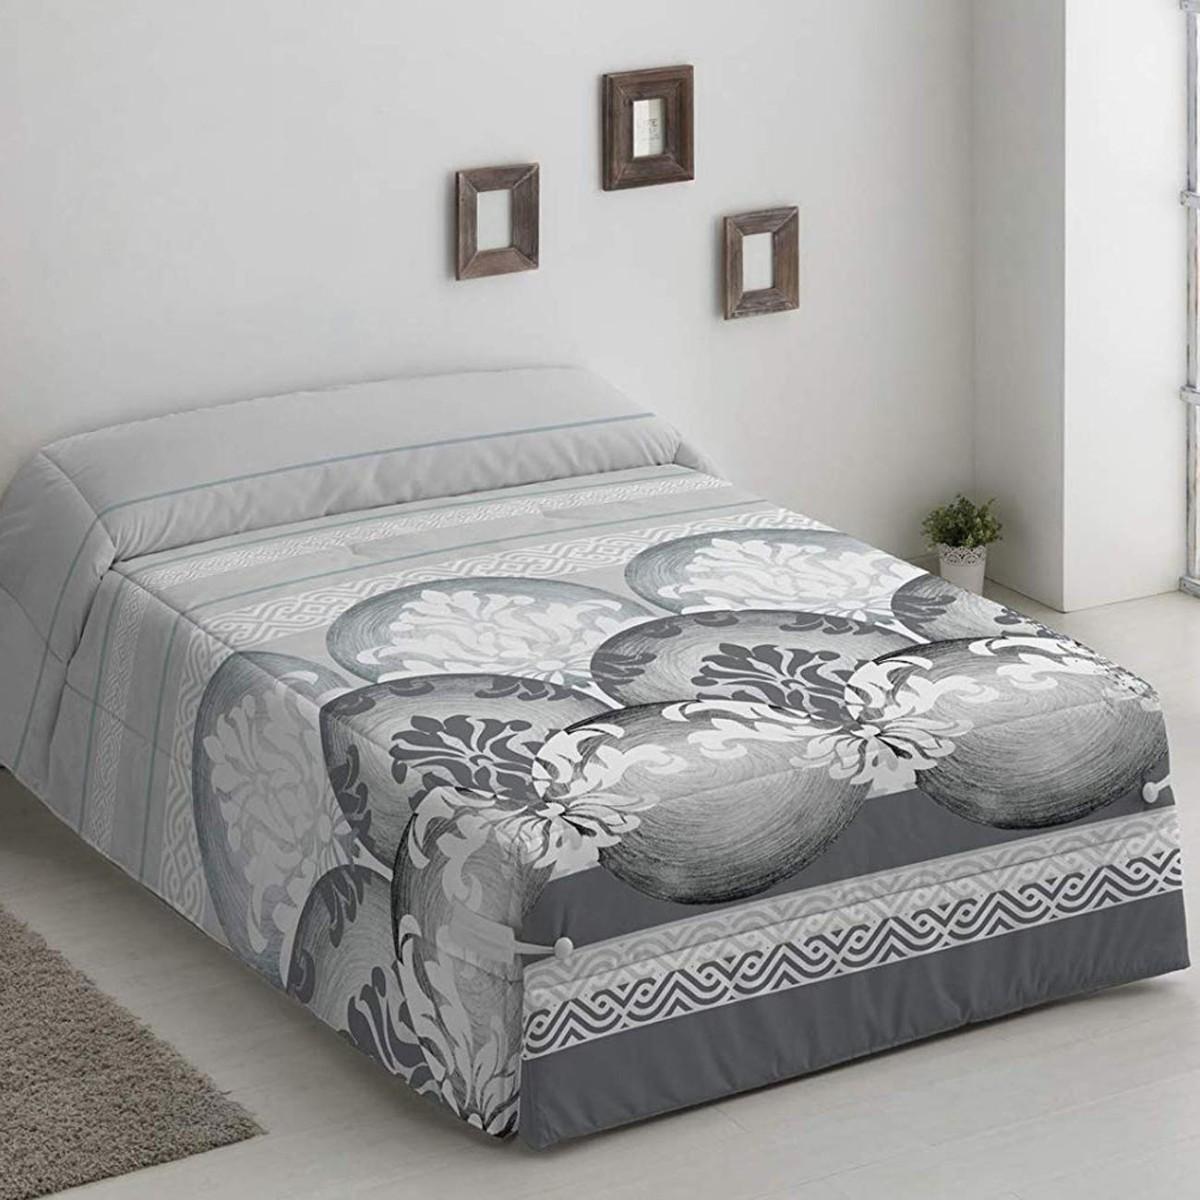 Conforter LEIRE Camatex